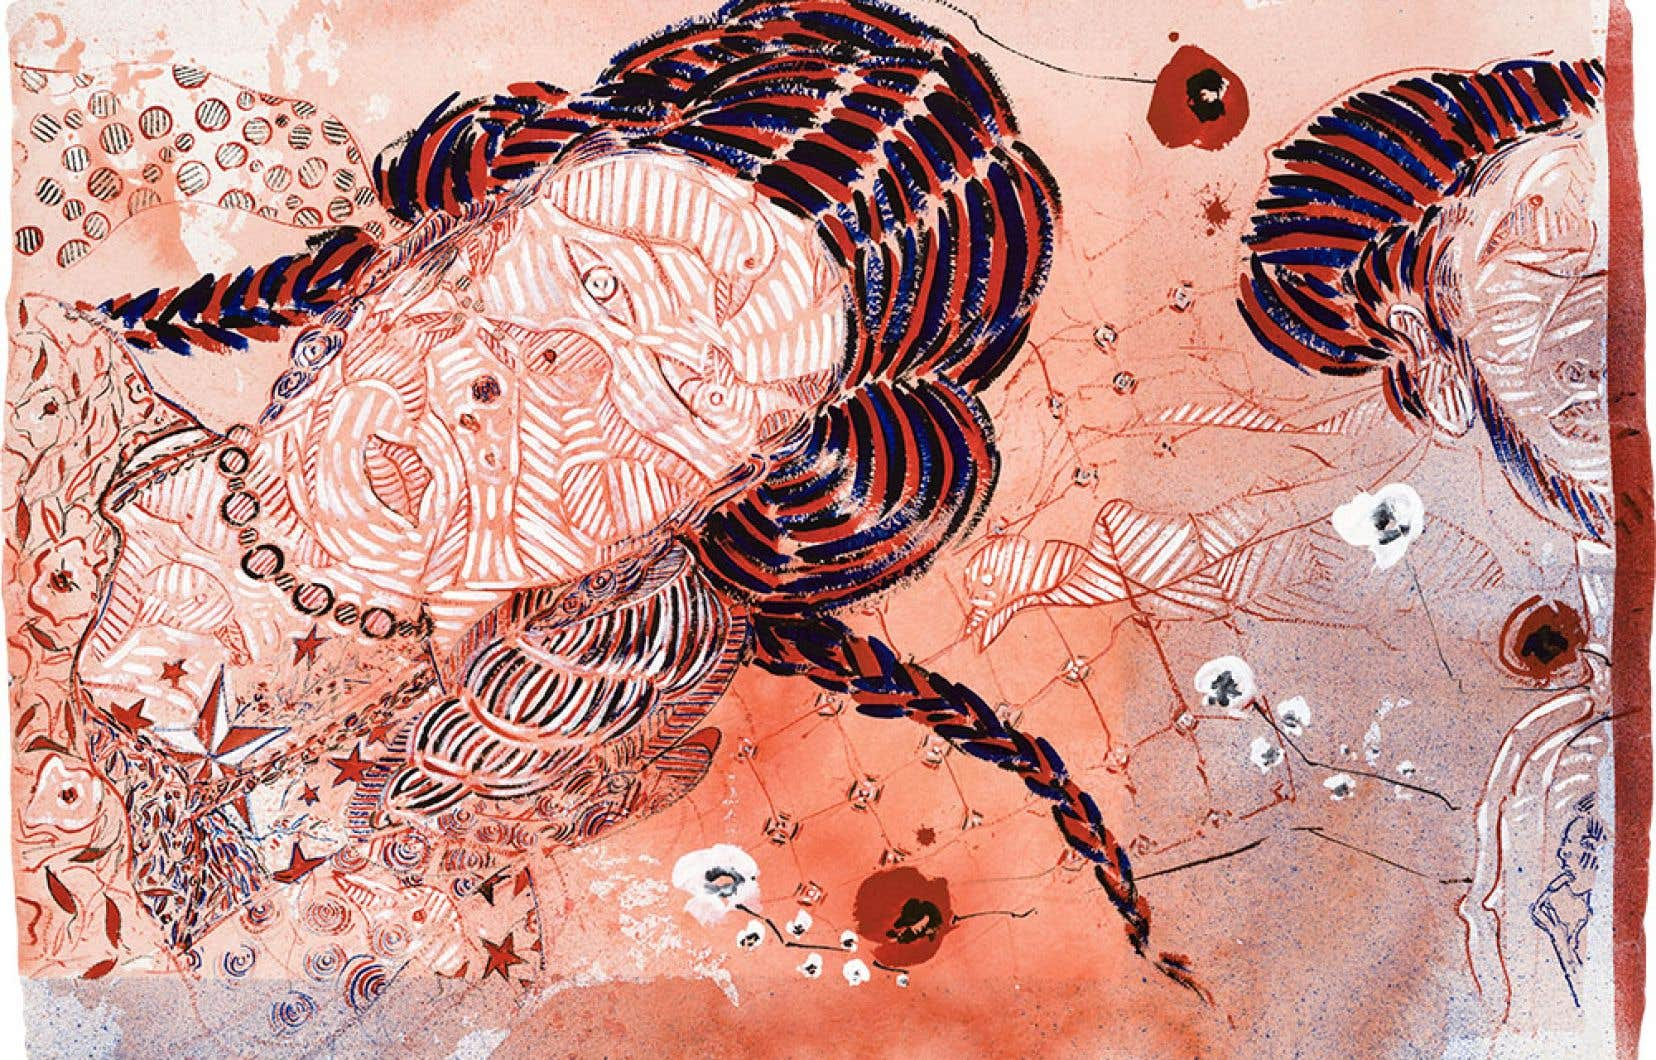 «Dream Figures in Moonlight (9/12)», François Morelli, 2015